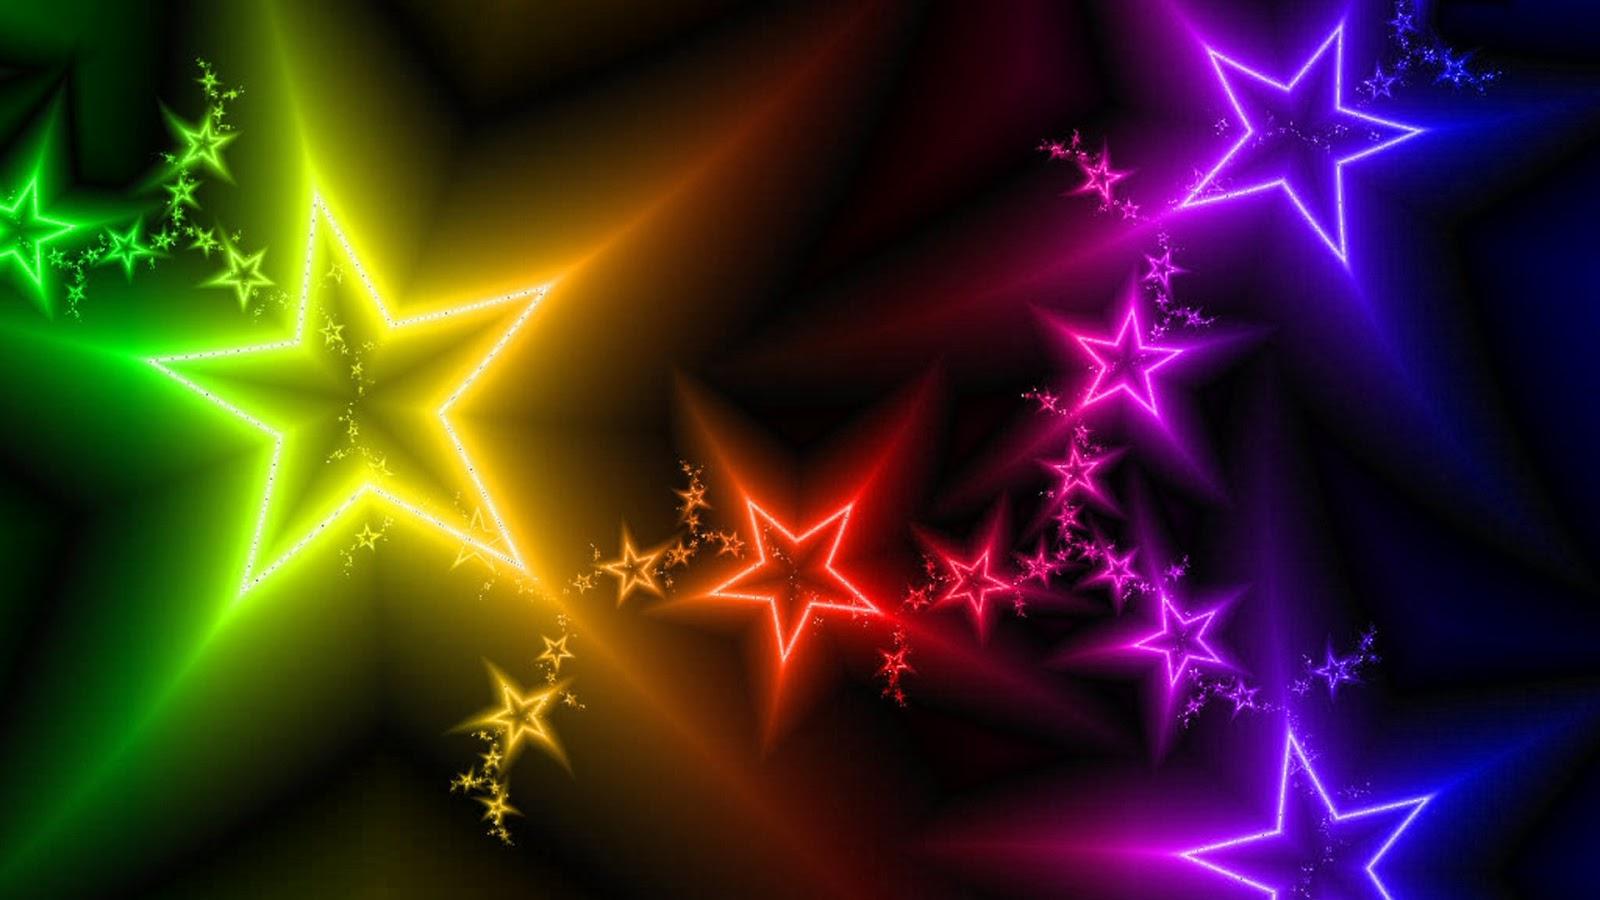 stars wallpaper animated stars wallpaper animated stars wallpaper 1600x900